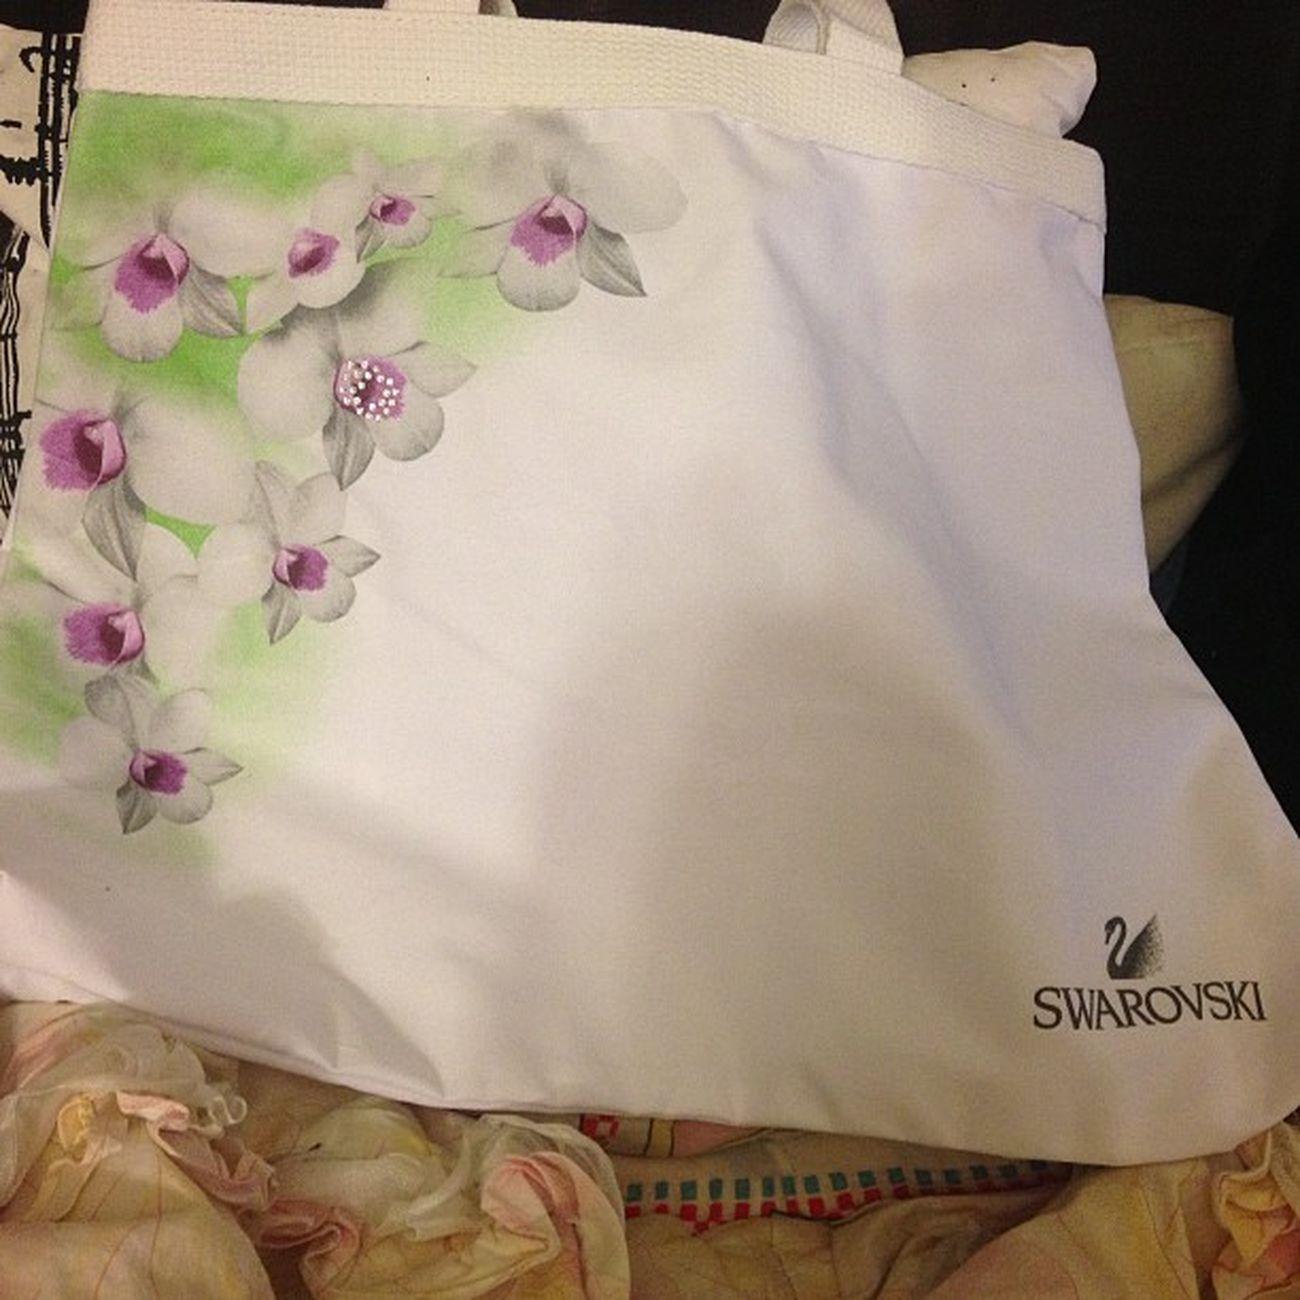 Swarovski SCS Jan 24th 2013 event free gift ☺ 😍 Swarovski Scsmember Scsevent January 2013 Tote Orchids Favoriteflower